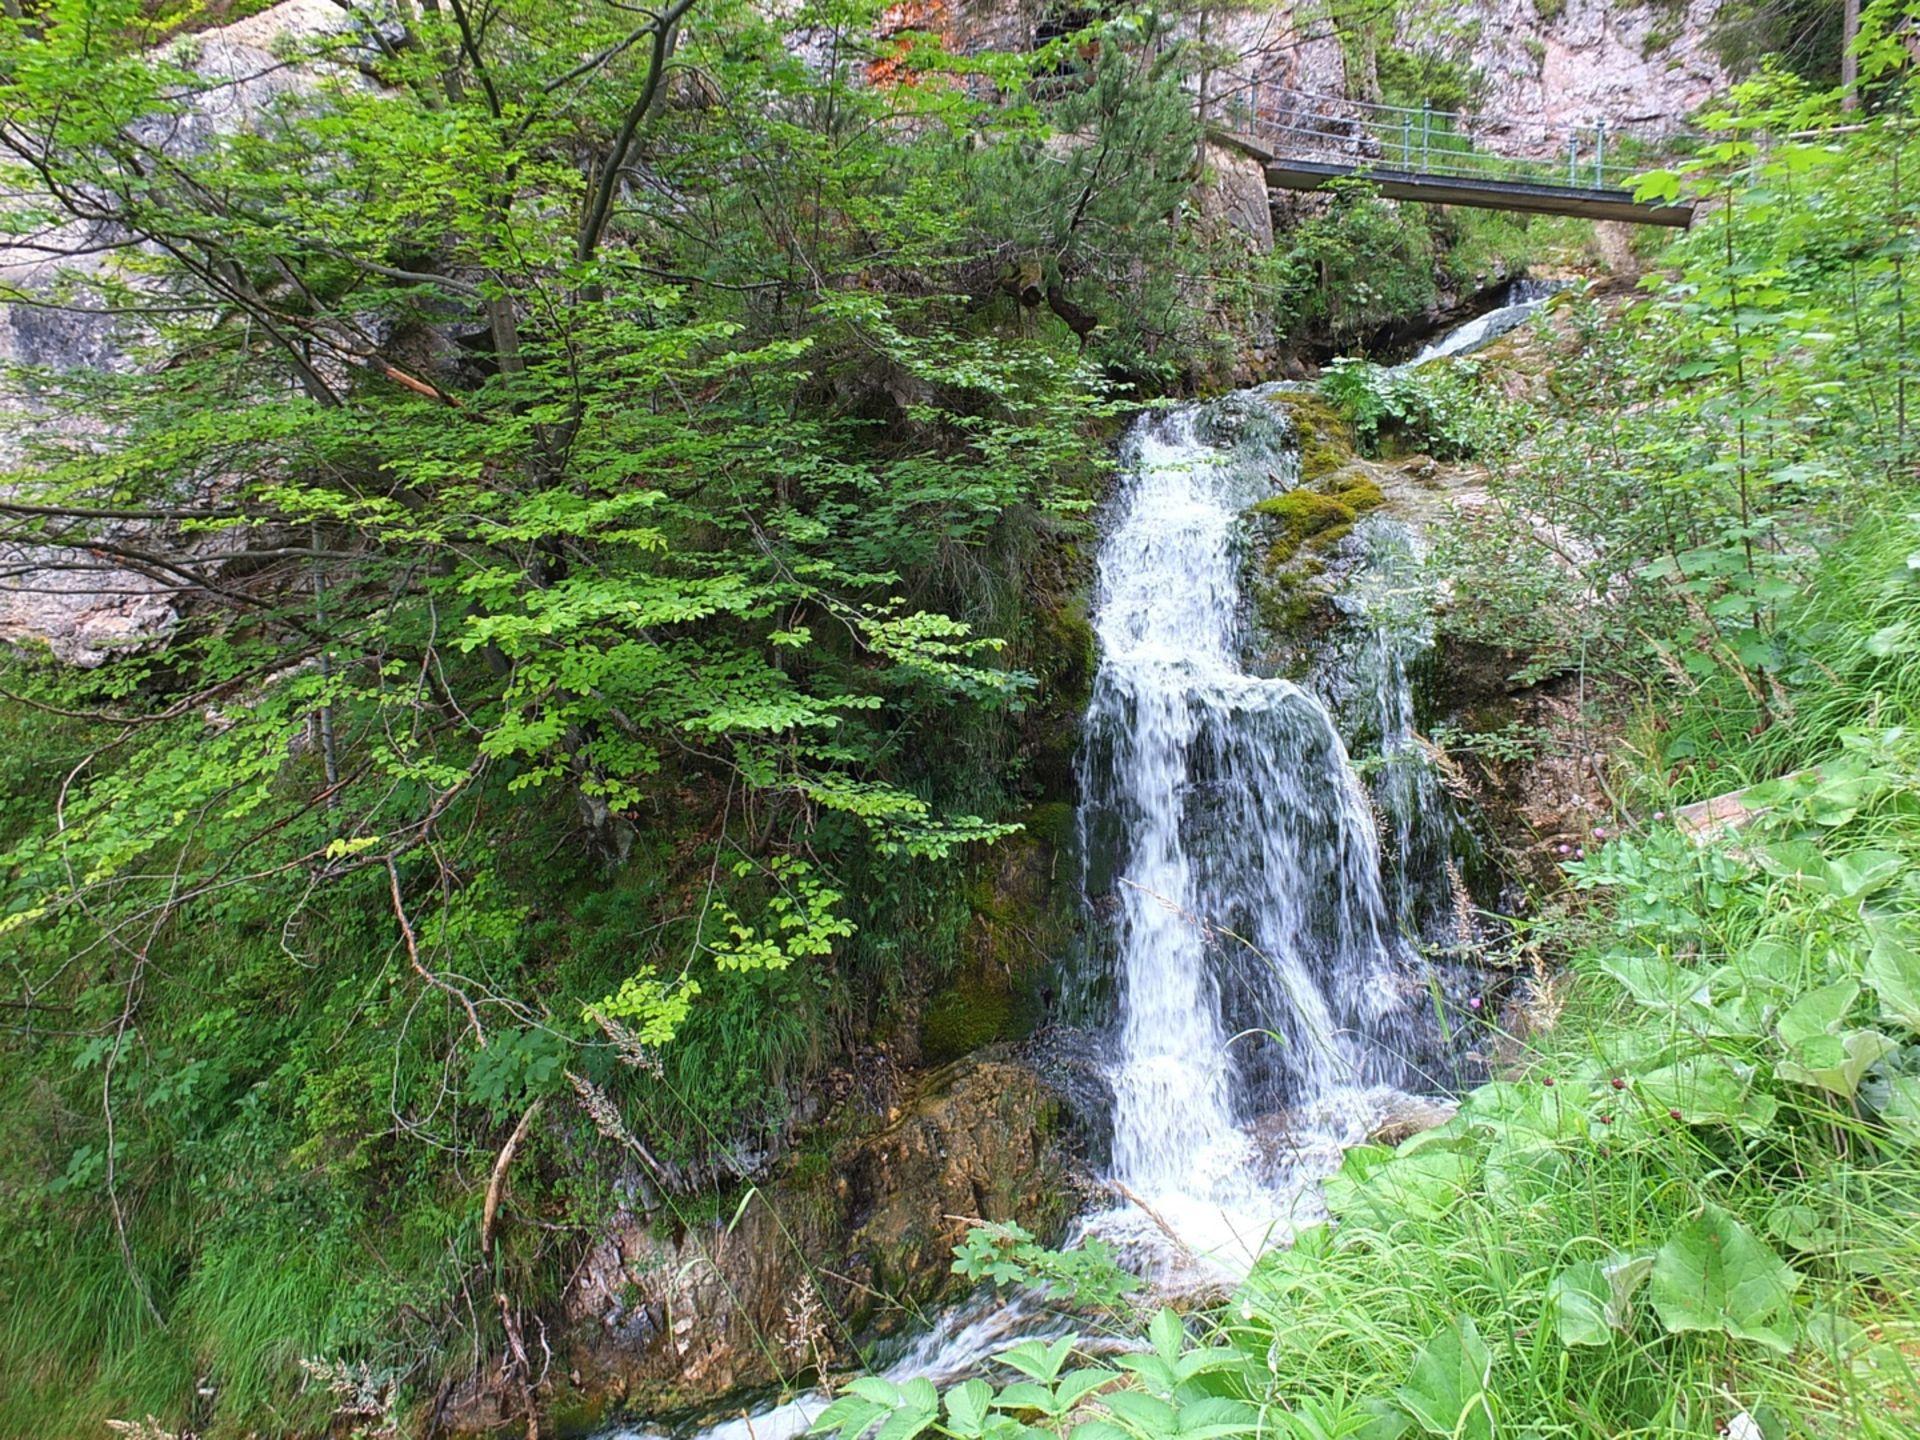 Detlef Paech, Wasserfall